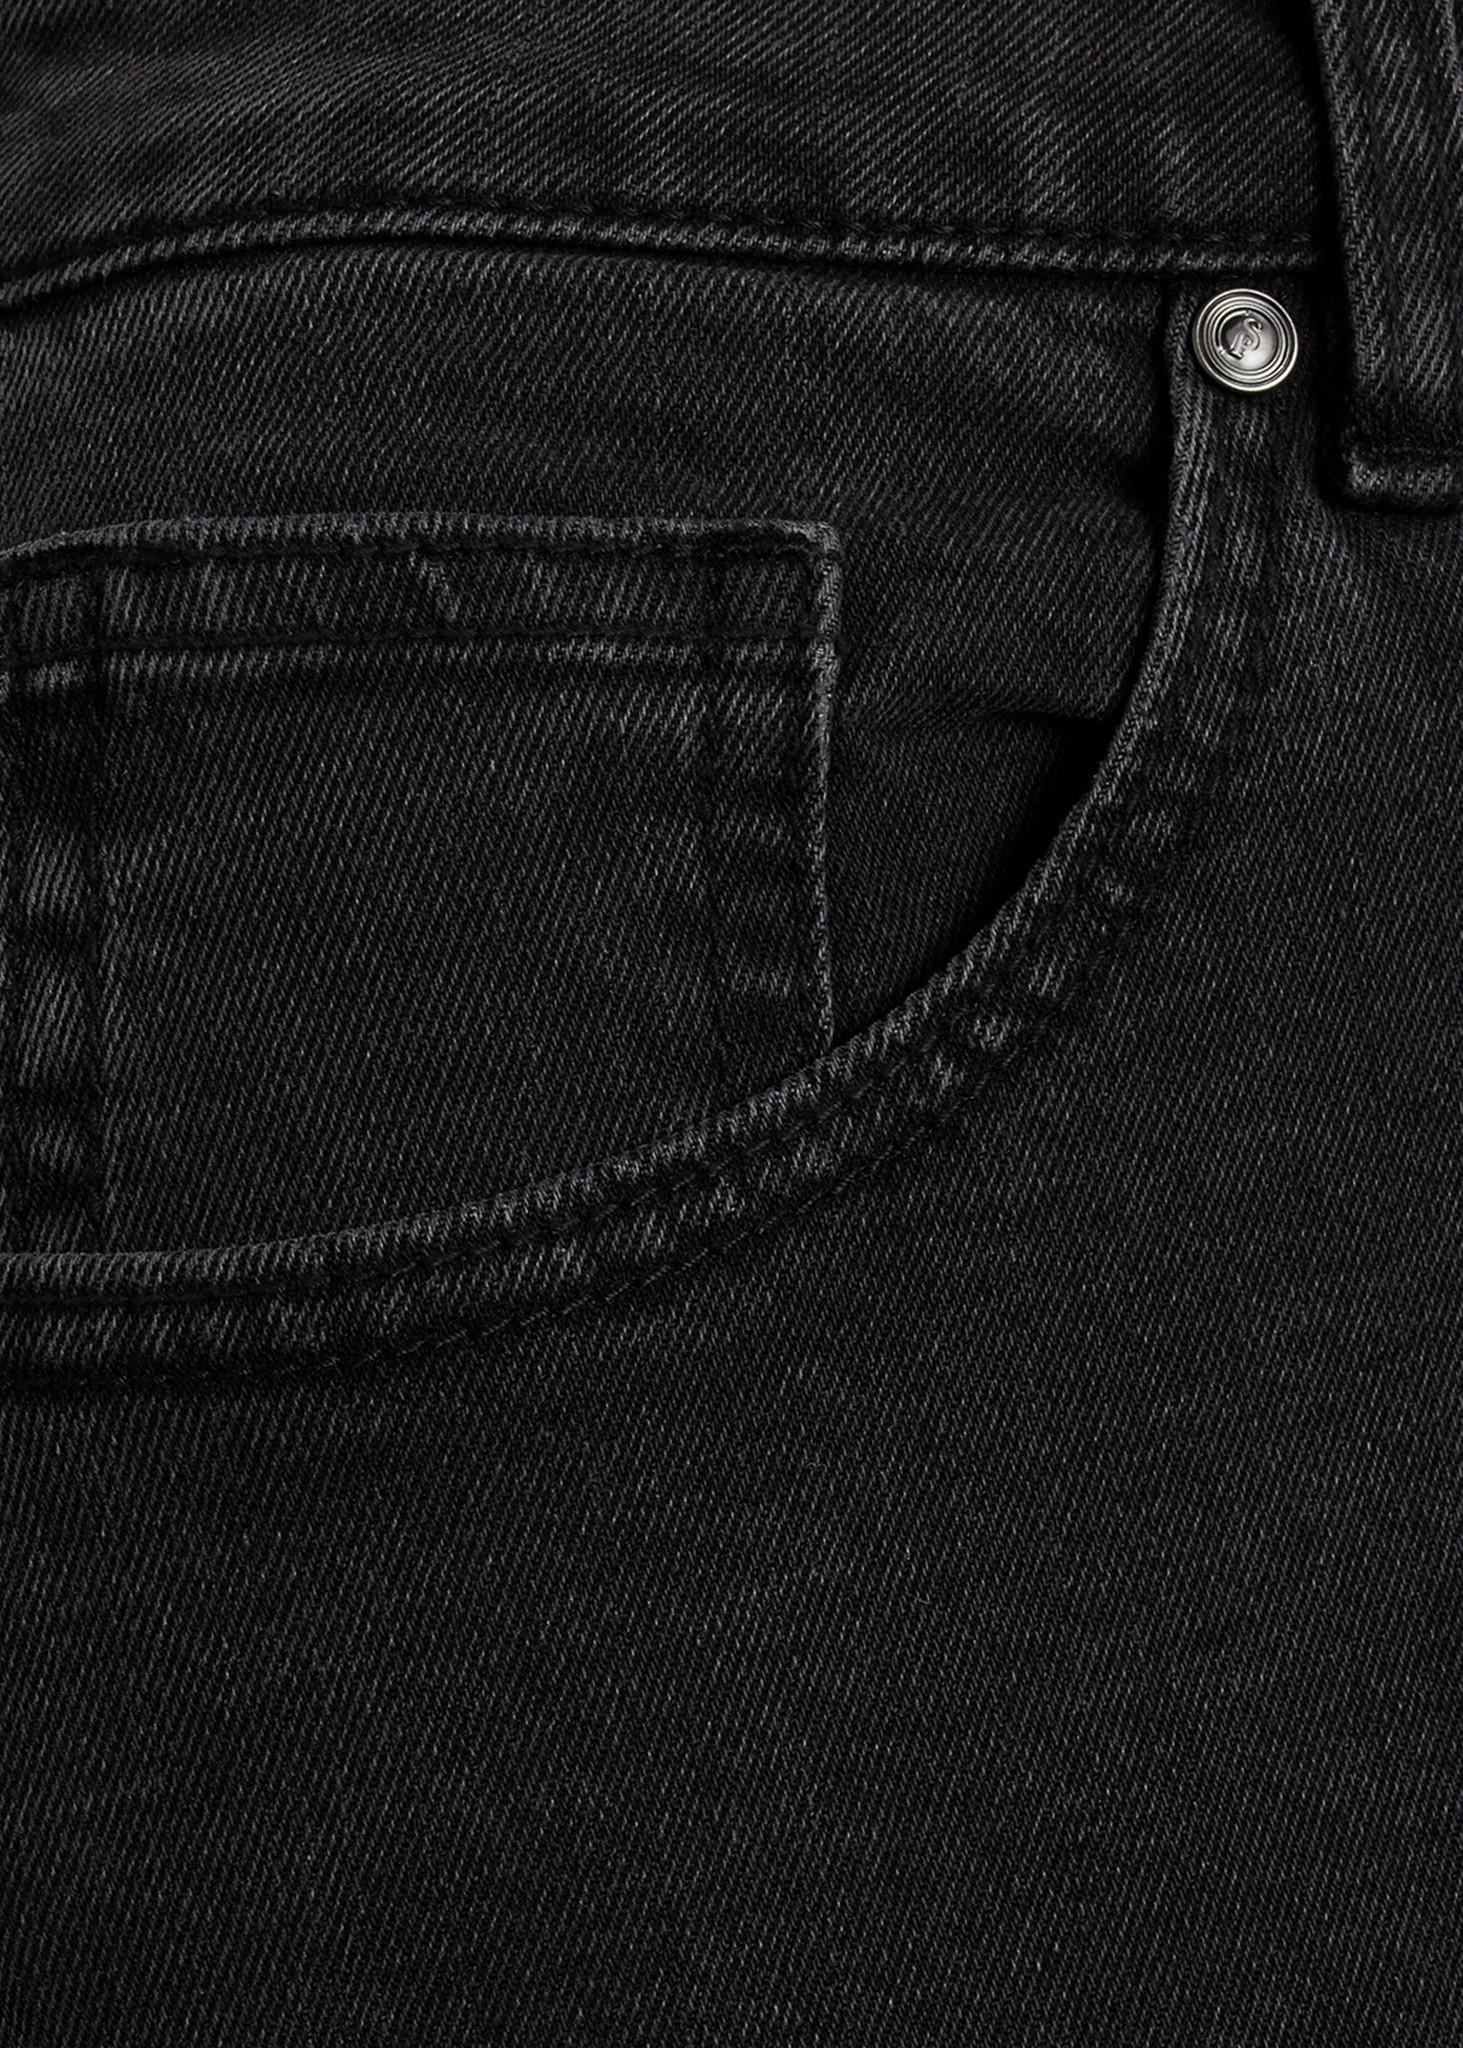 Ossy Short Black Wash-3